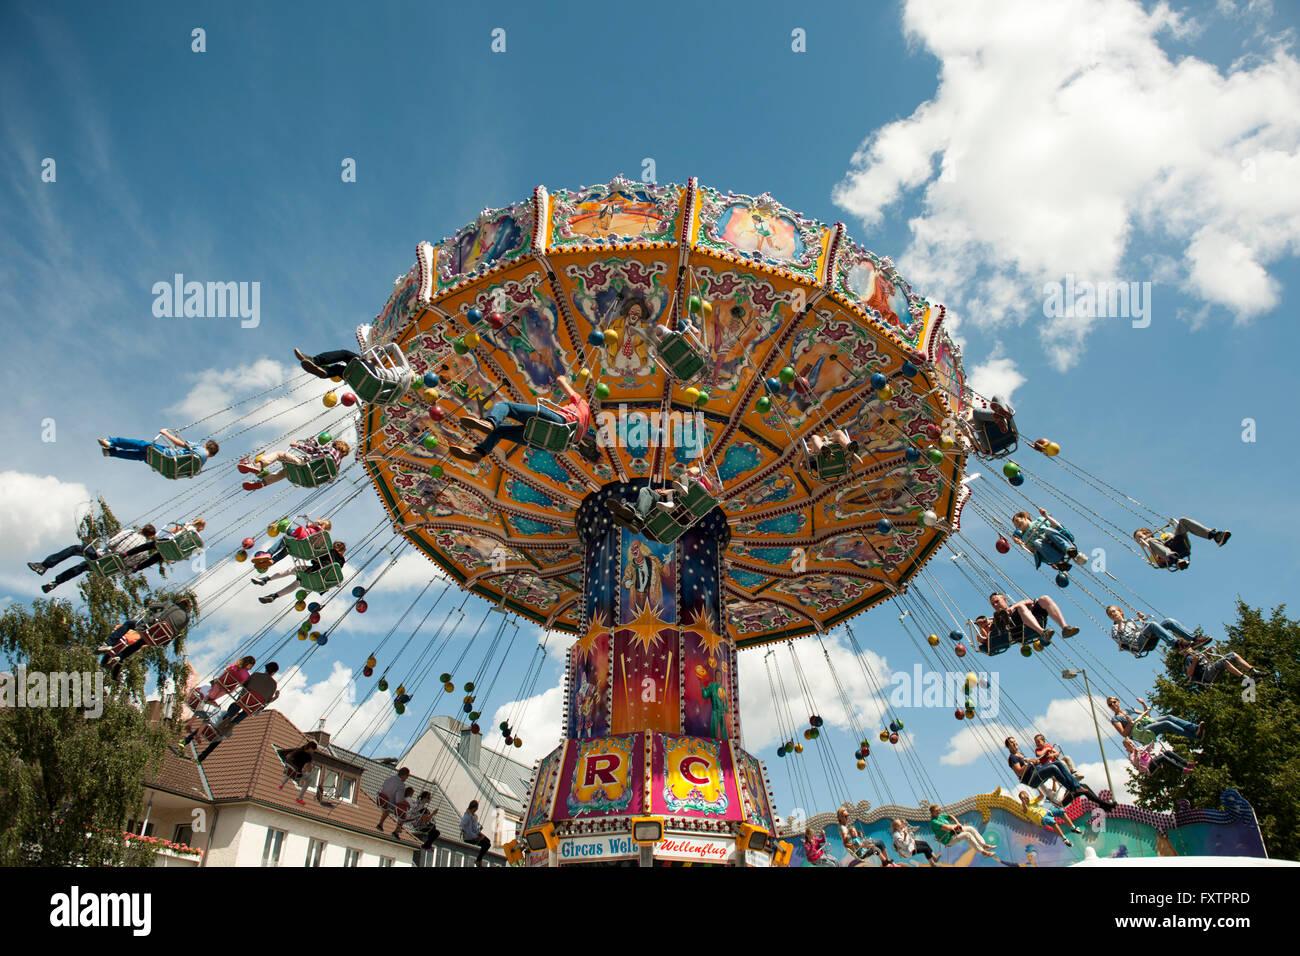 Deutschland, Nordrhein-Westfalen, Paderborn, Libori-Fest, Kirmes am Liboriberg - Stock Image